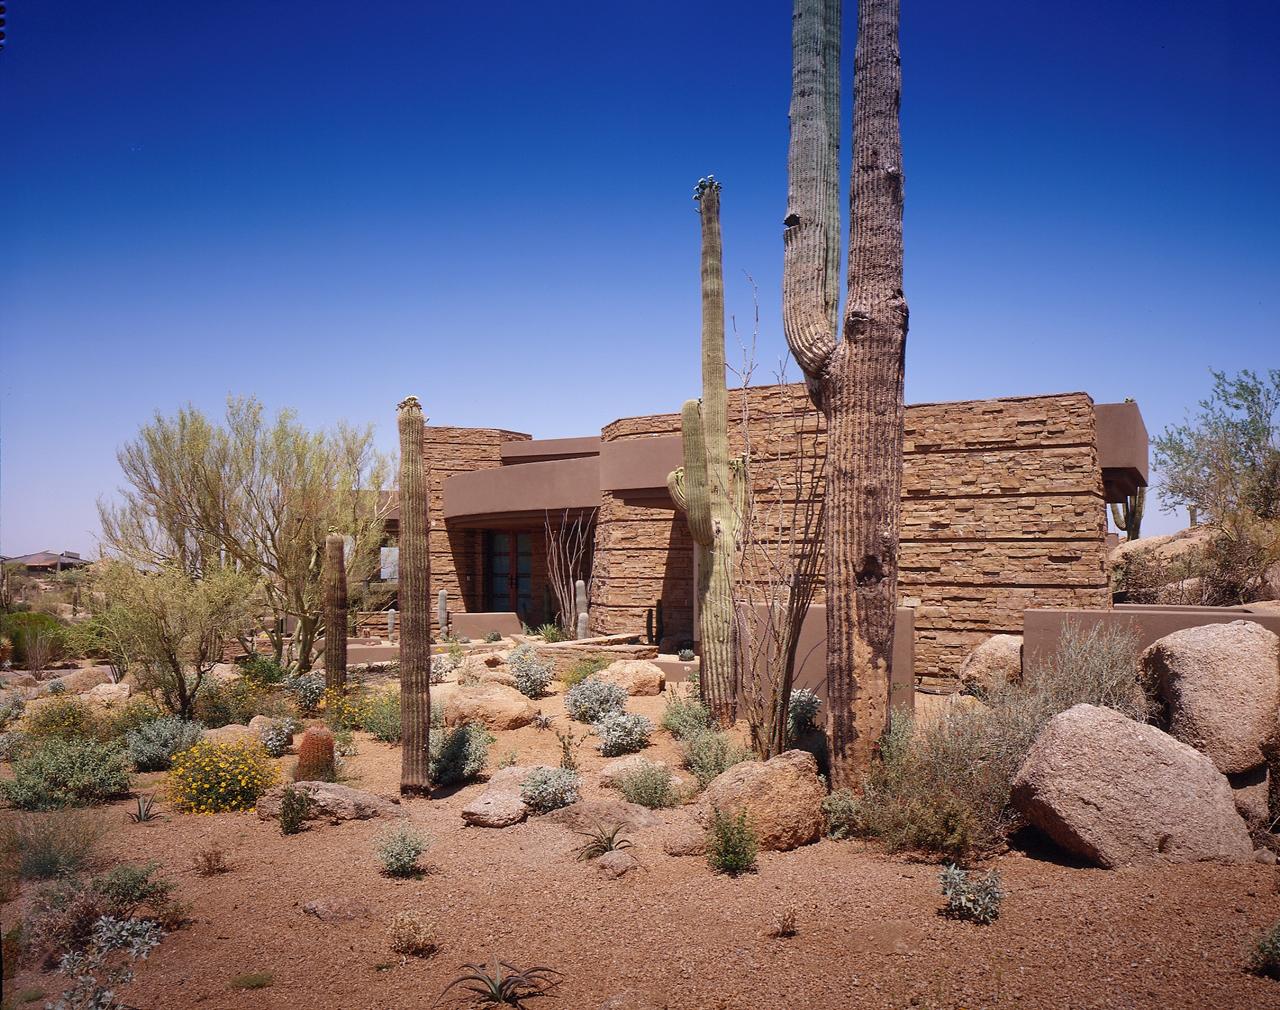 Modern Desert House For Luxury Life In The Nature